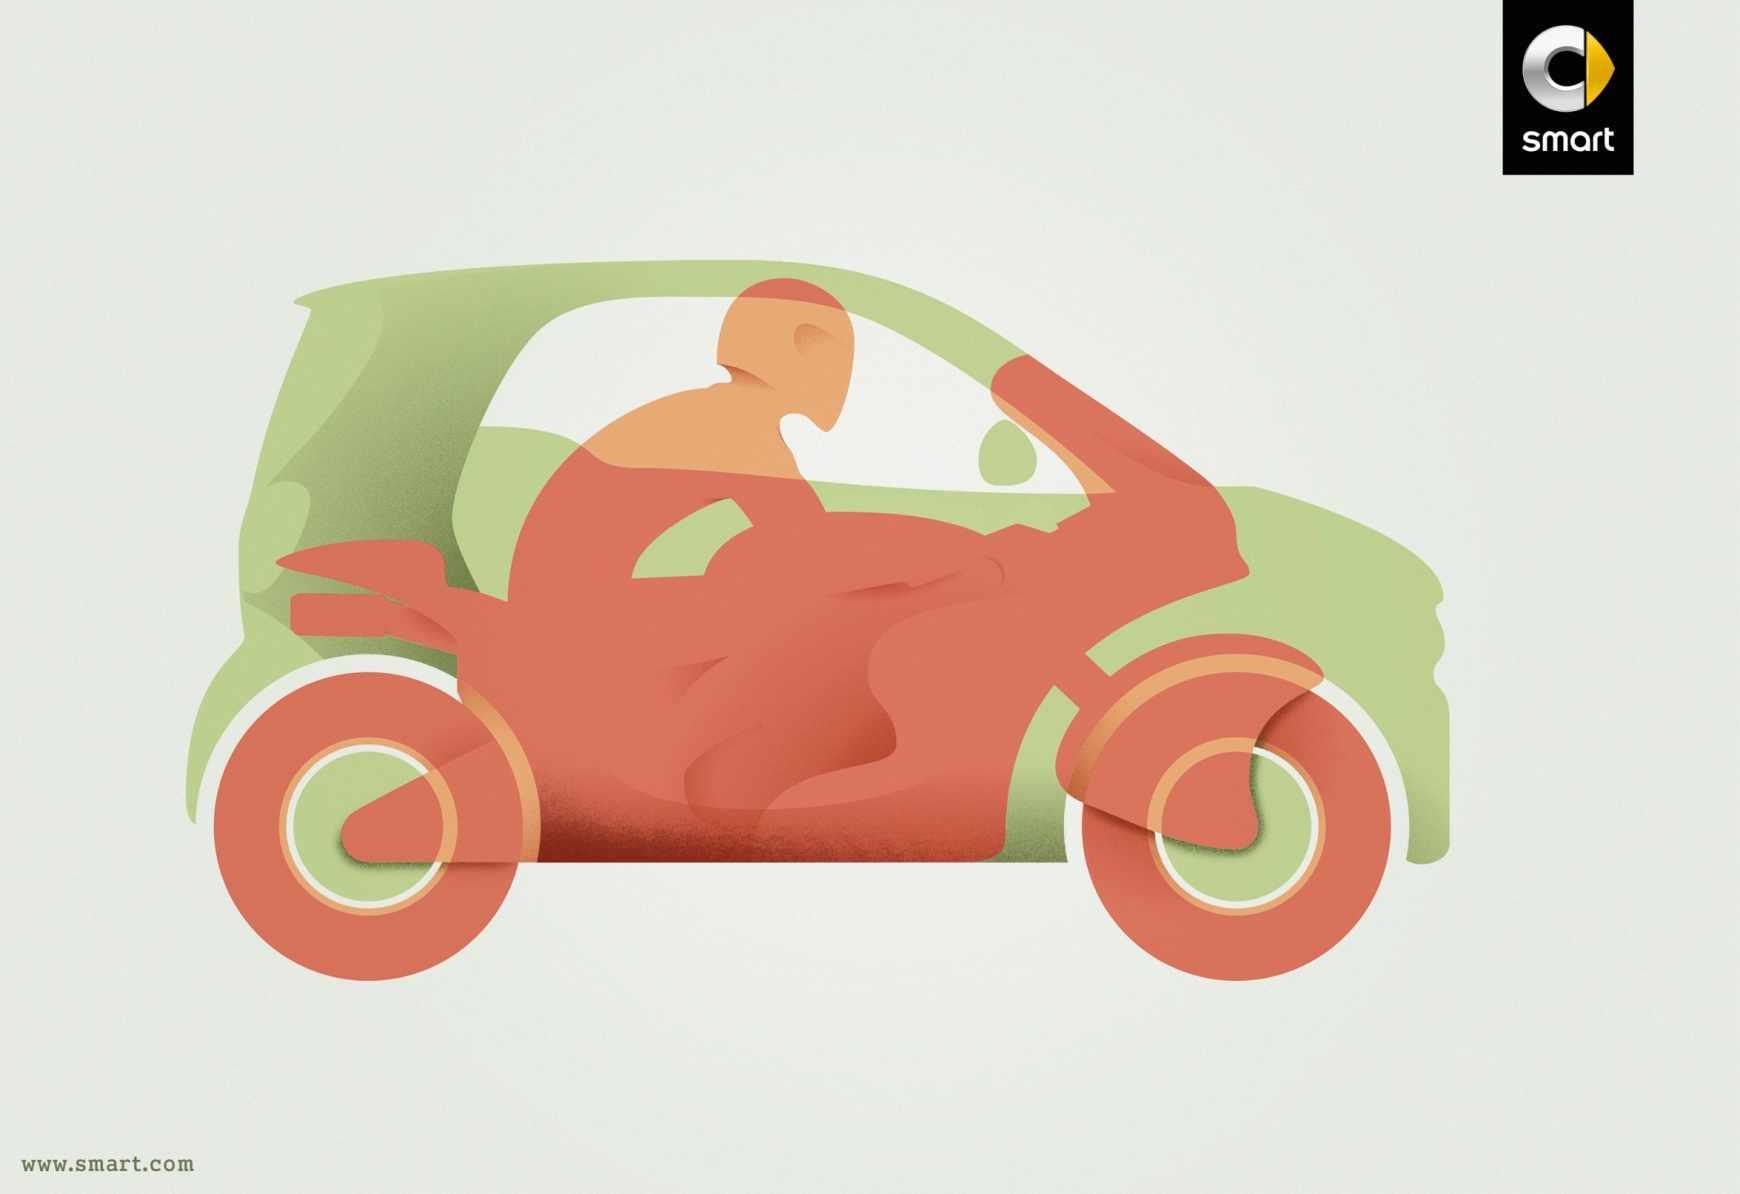 smart 汽车摩托车篇平面创意广告设计图片